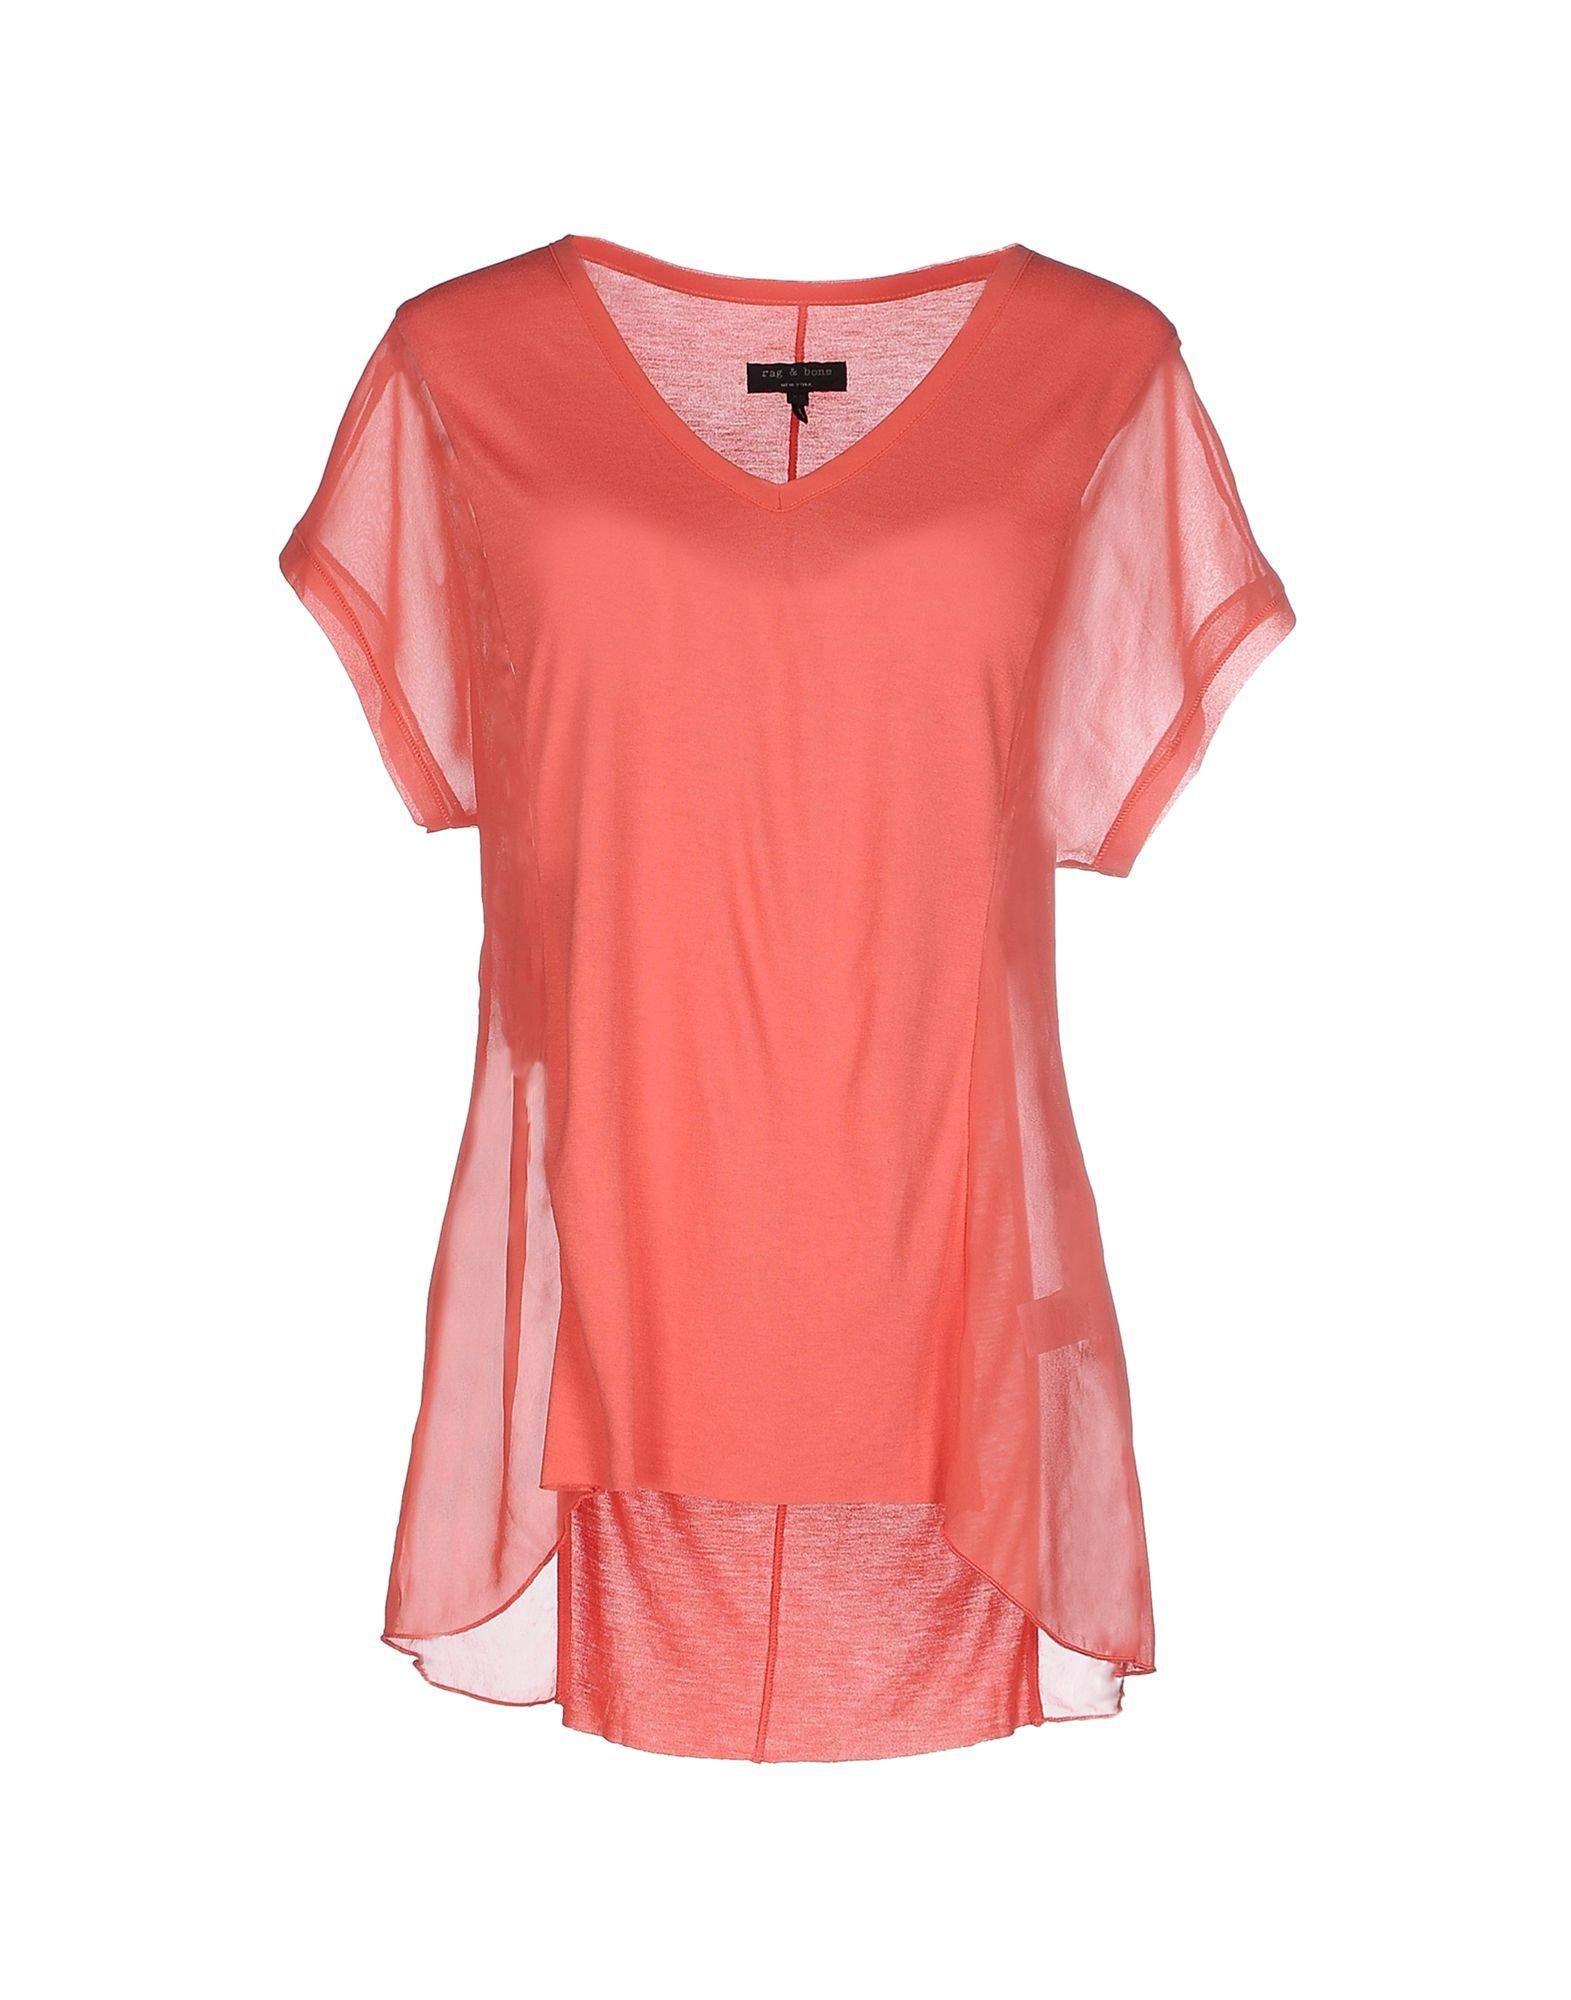 Rag bone t shirt in pink lyst for Rag and bone t shirts